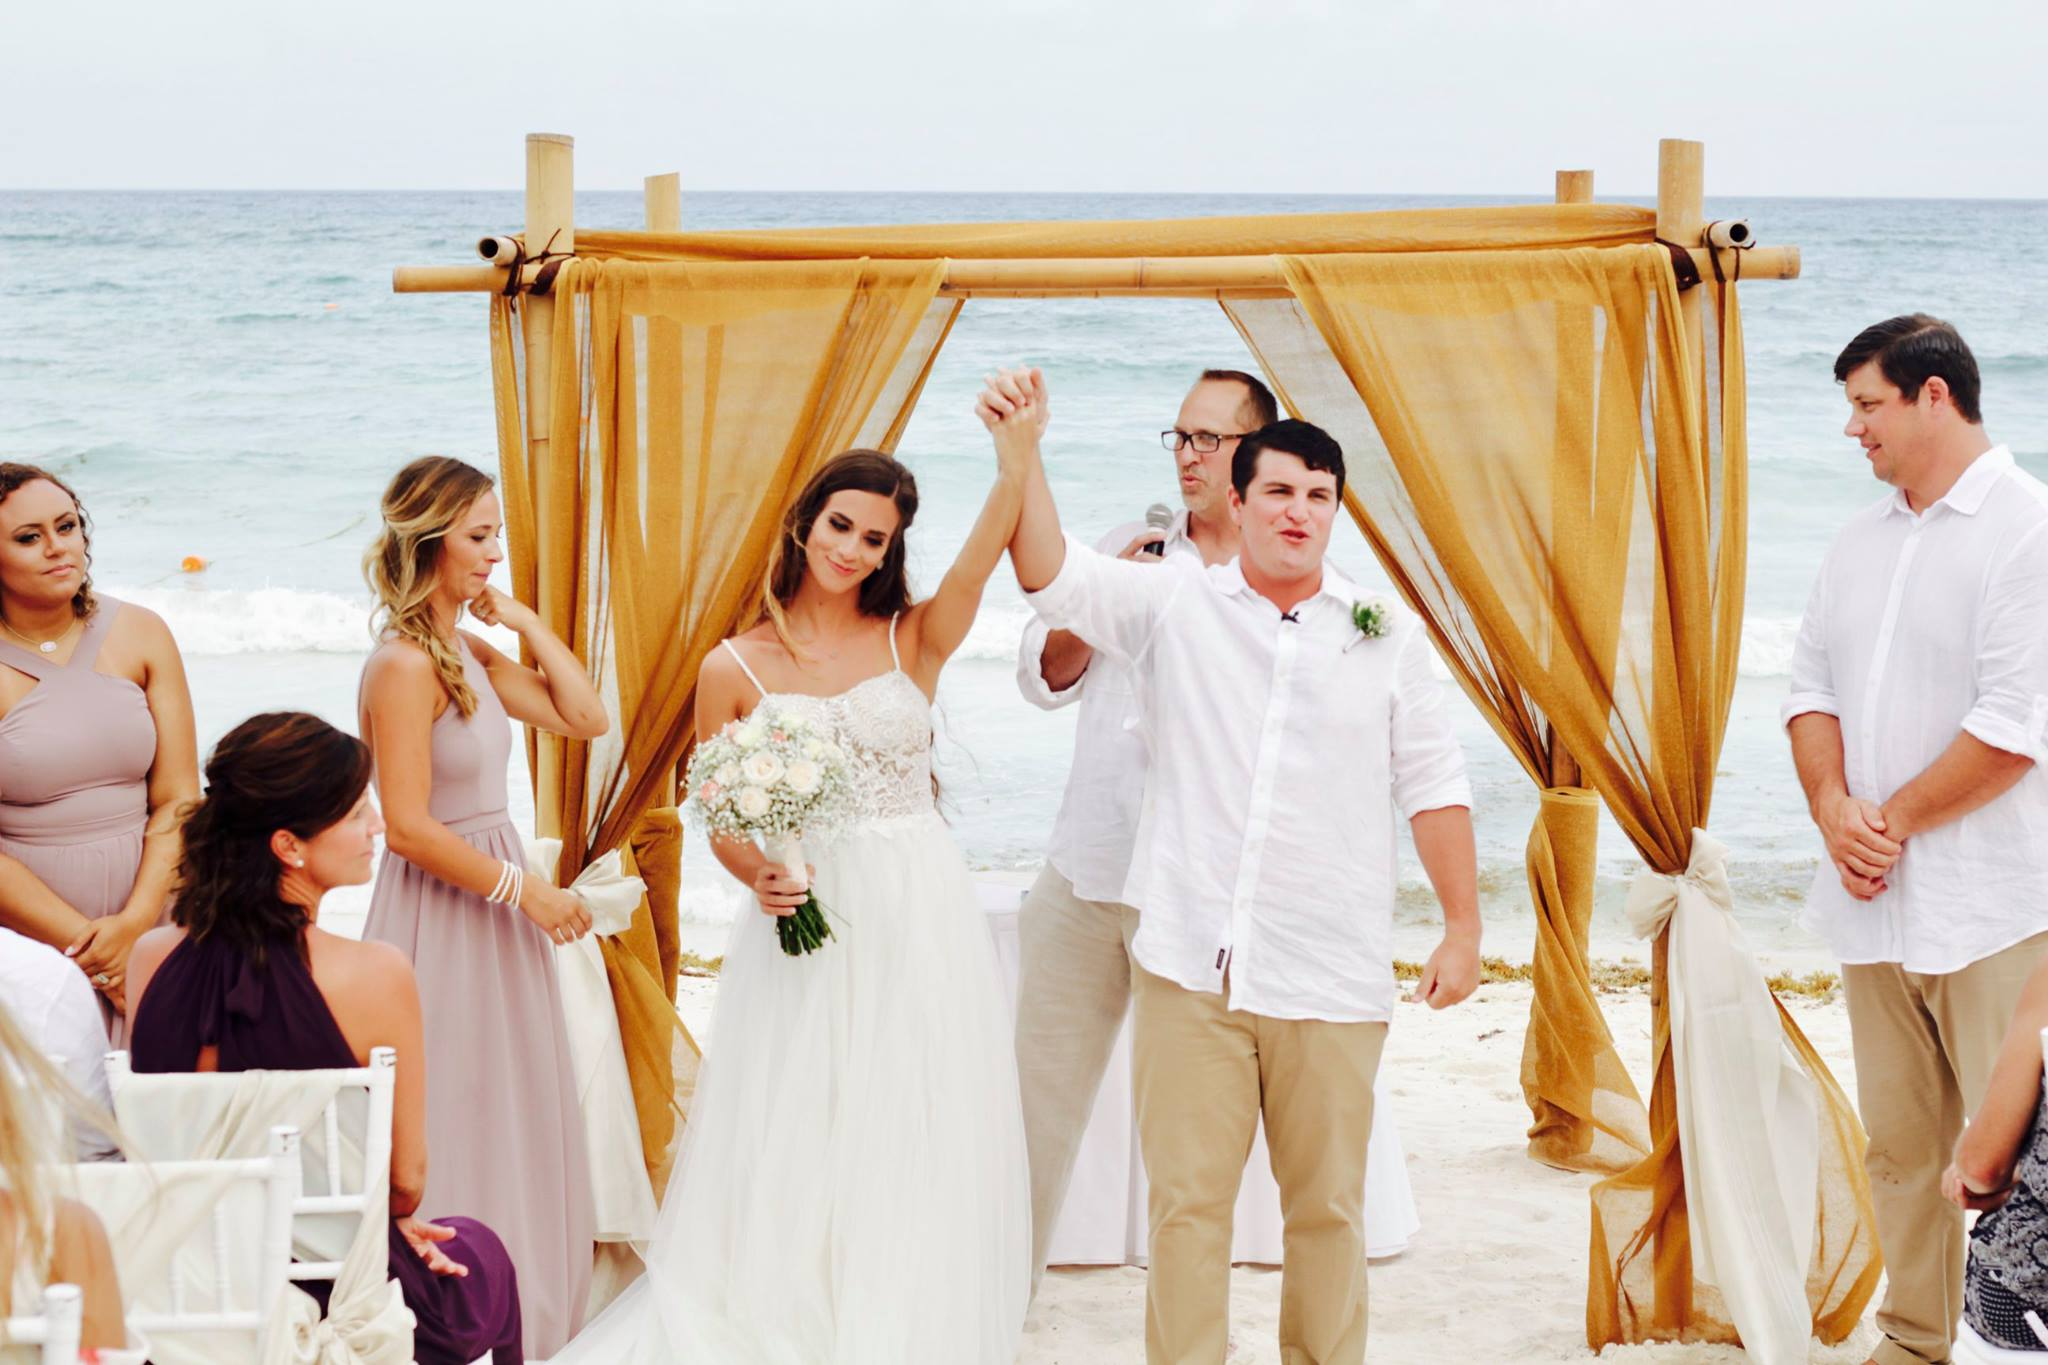 Morgan + John || Destination Wedding